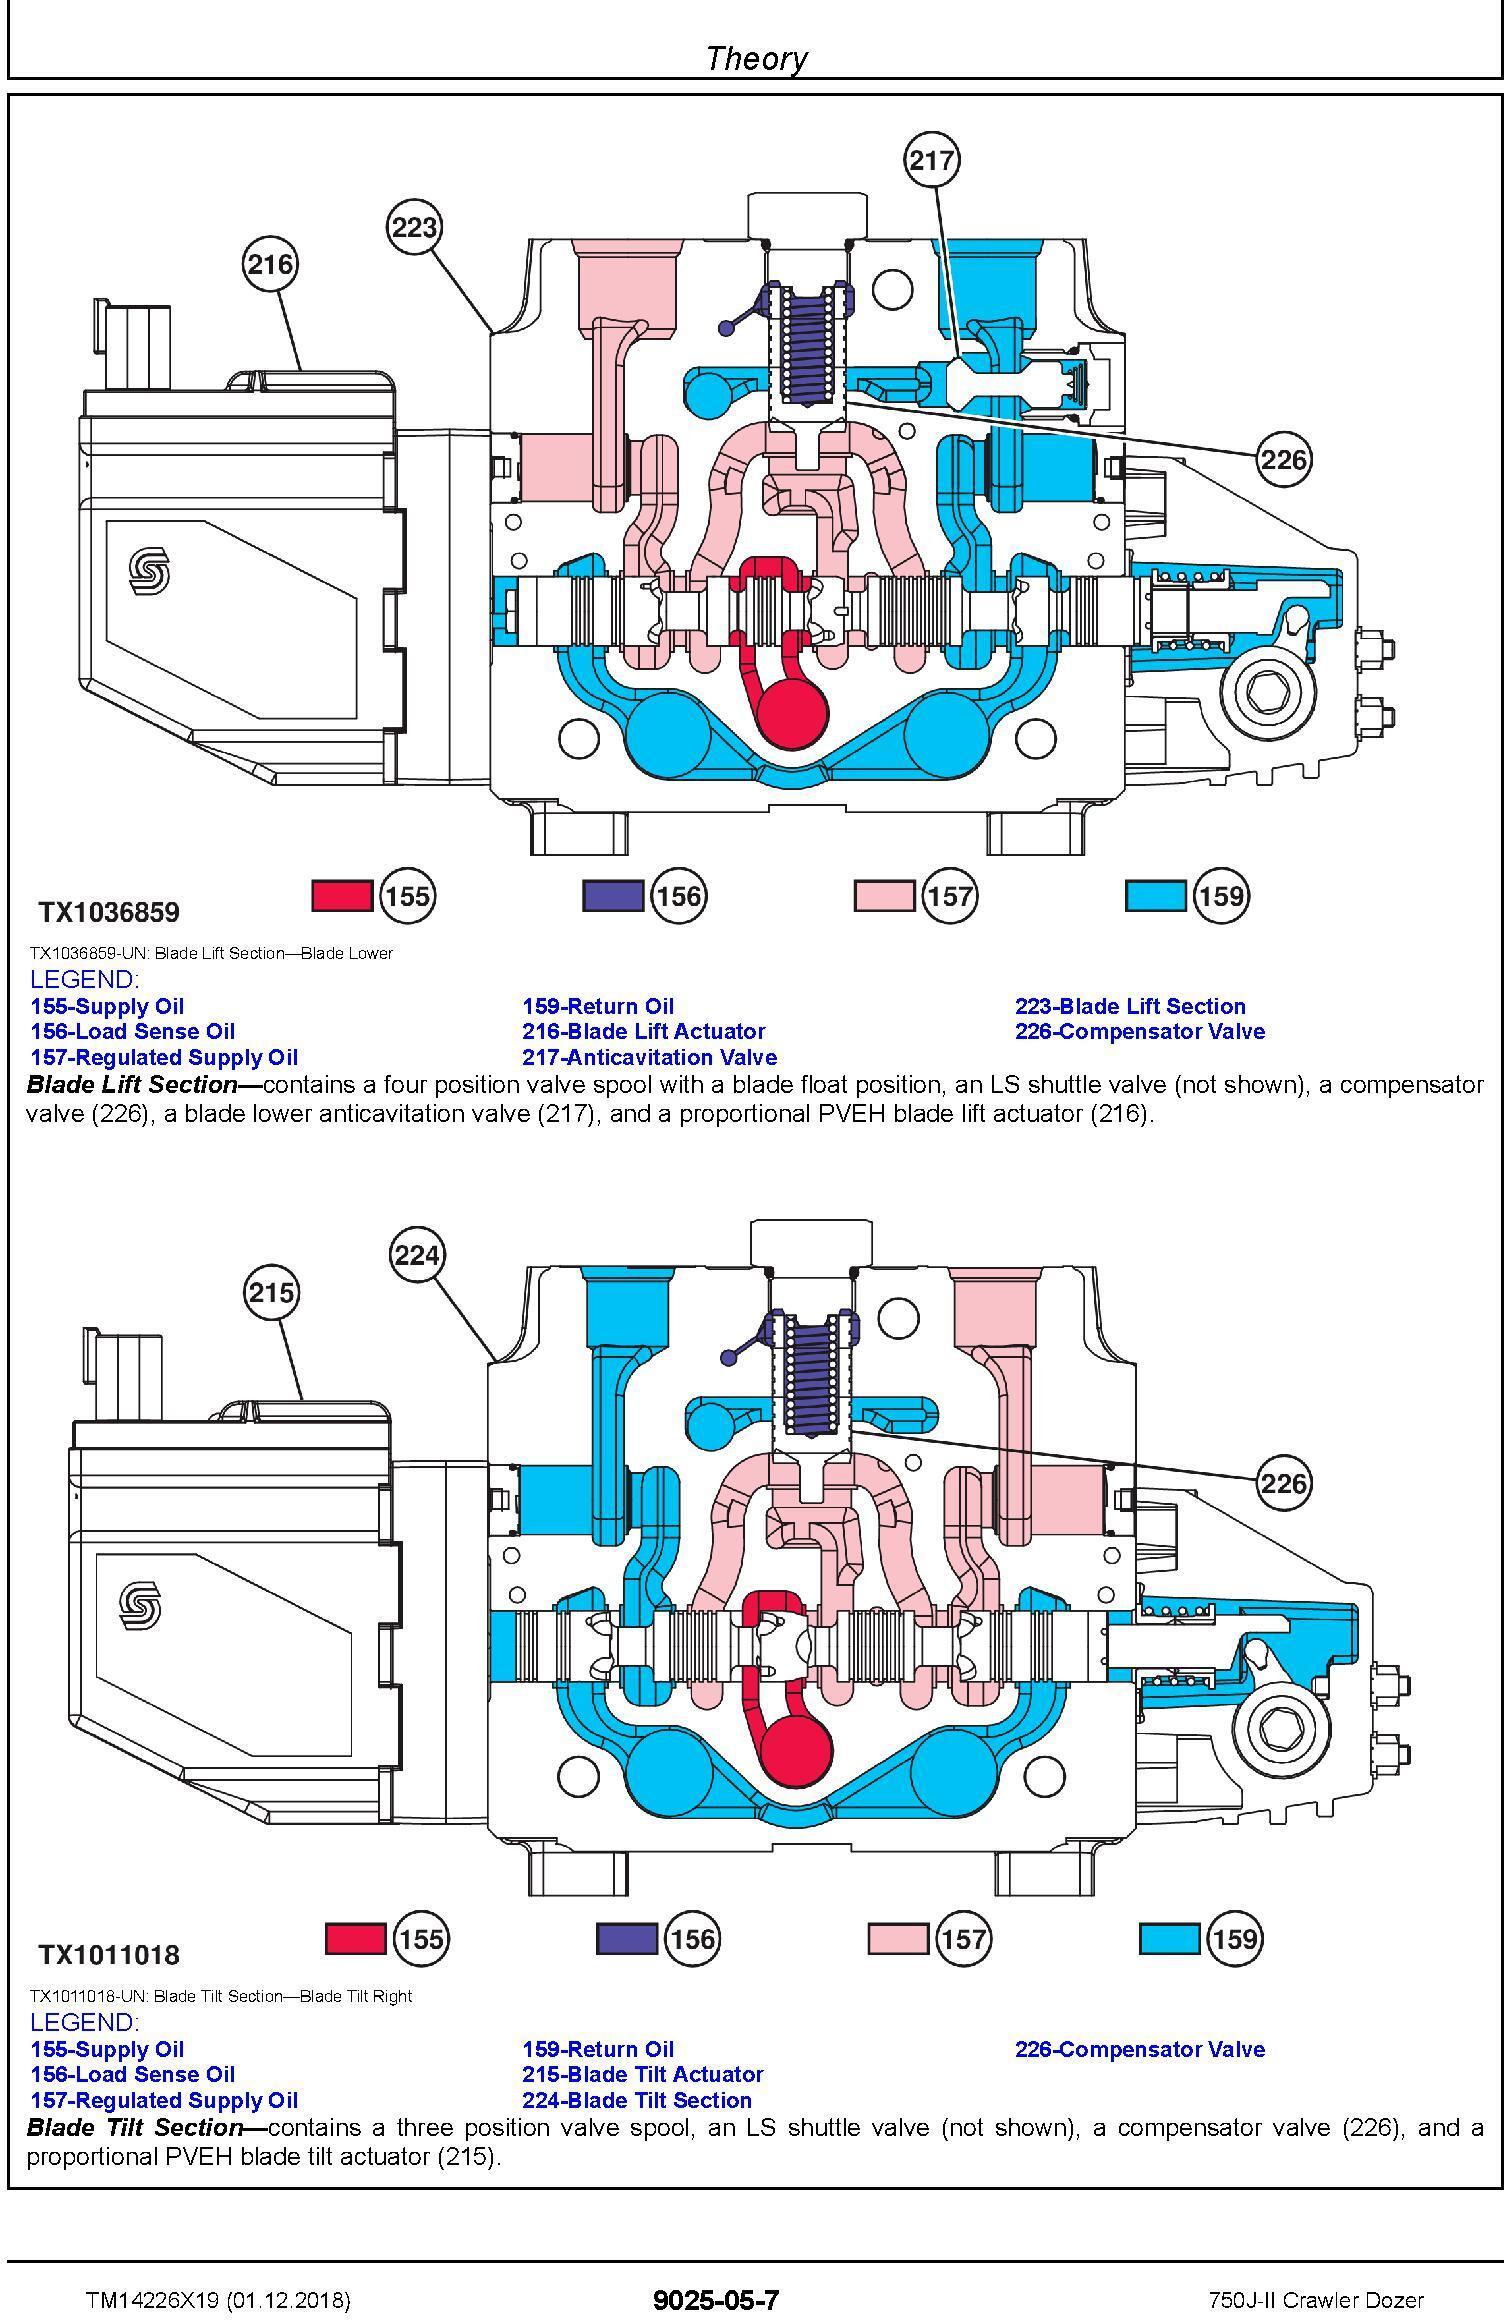 John Deere 750J-II (SN. D306890-330911) Crawler Dozer Operation & Test Technical Manual (TM14226X19) - 2